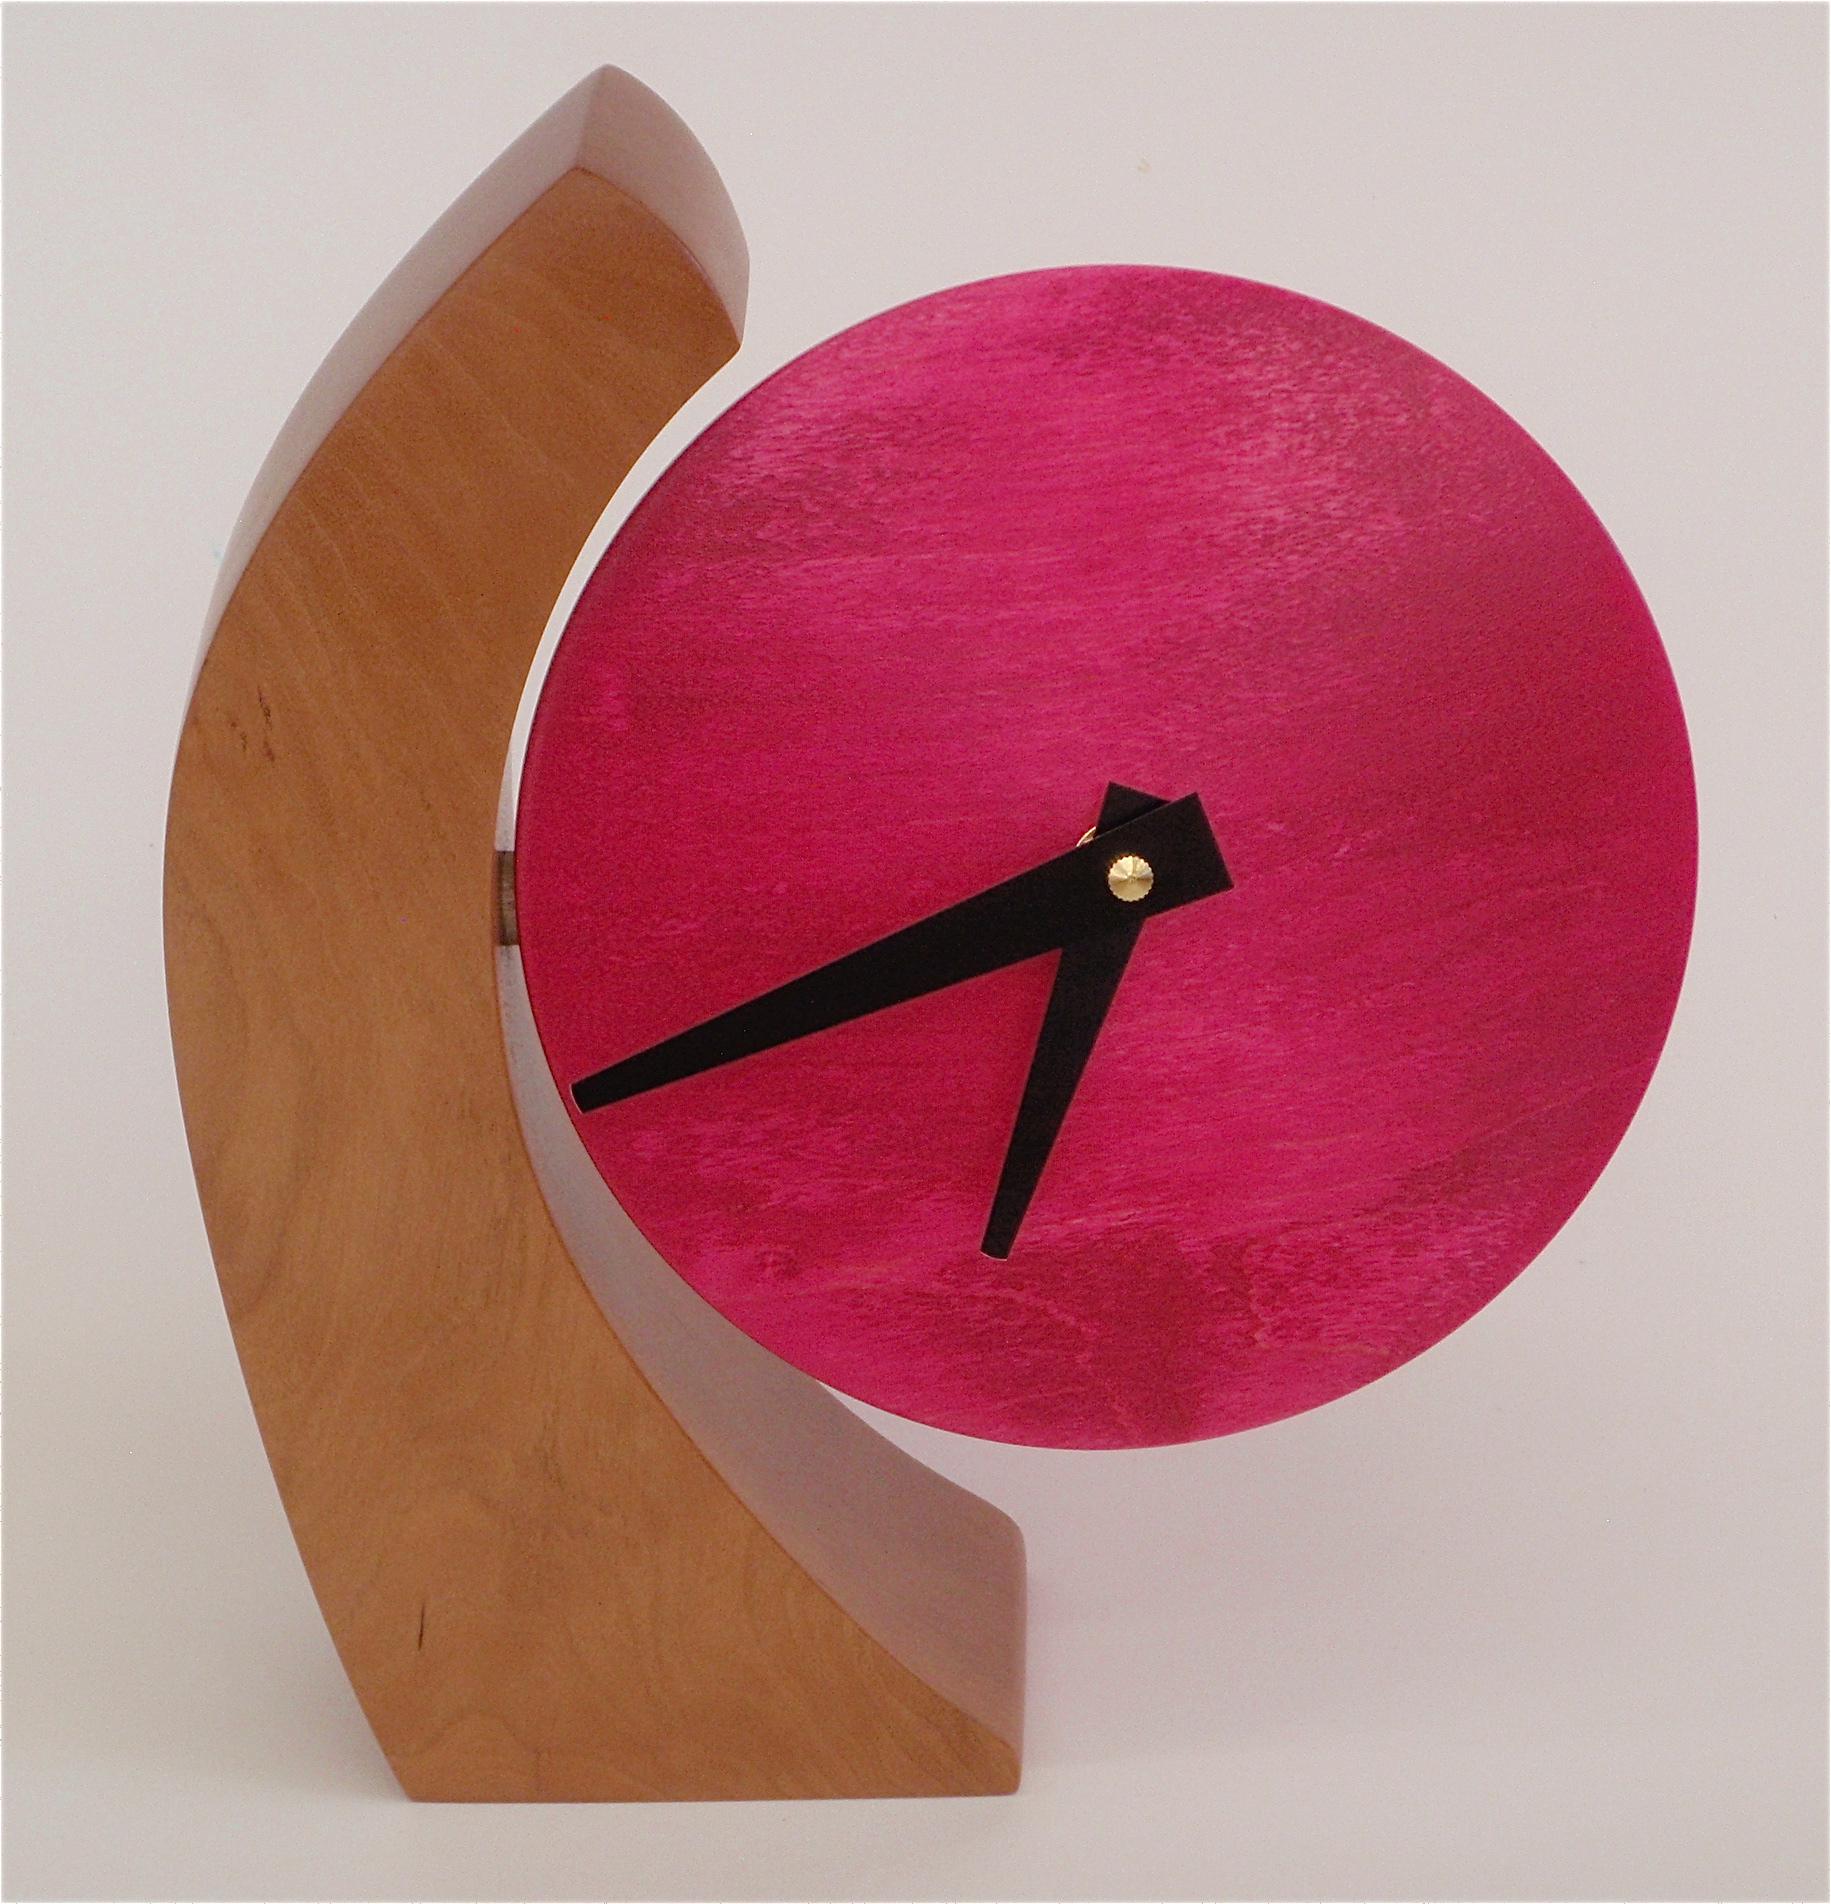 Adjustable desk clock 06